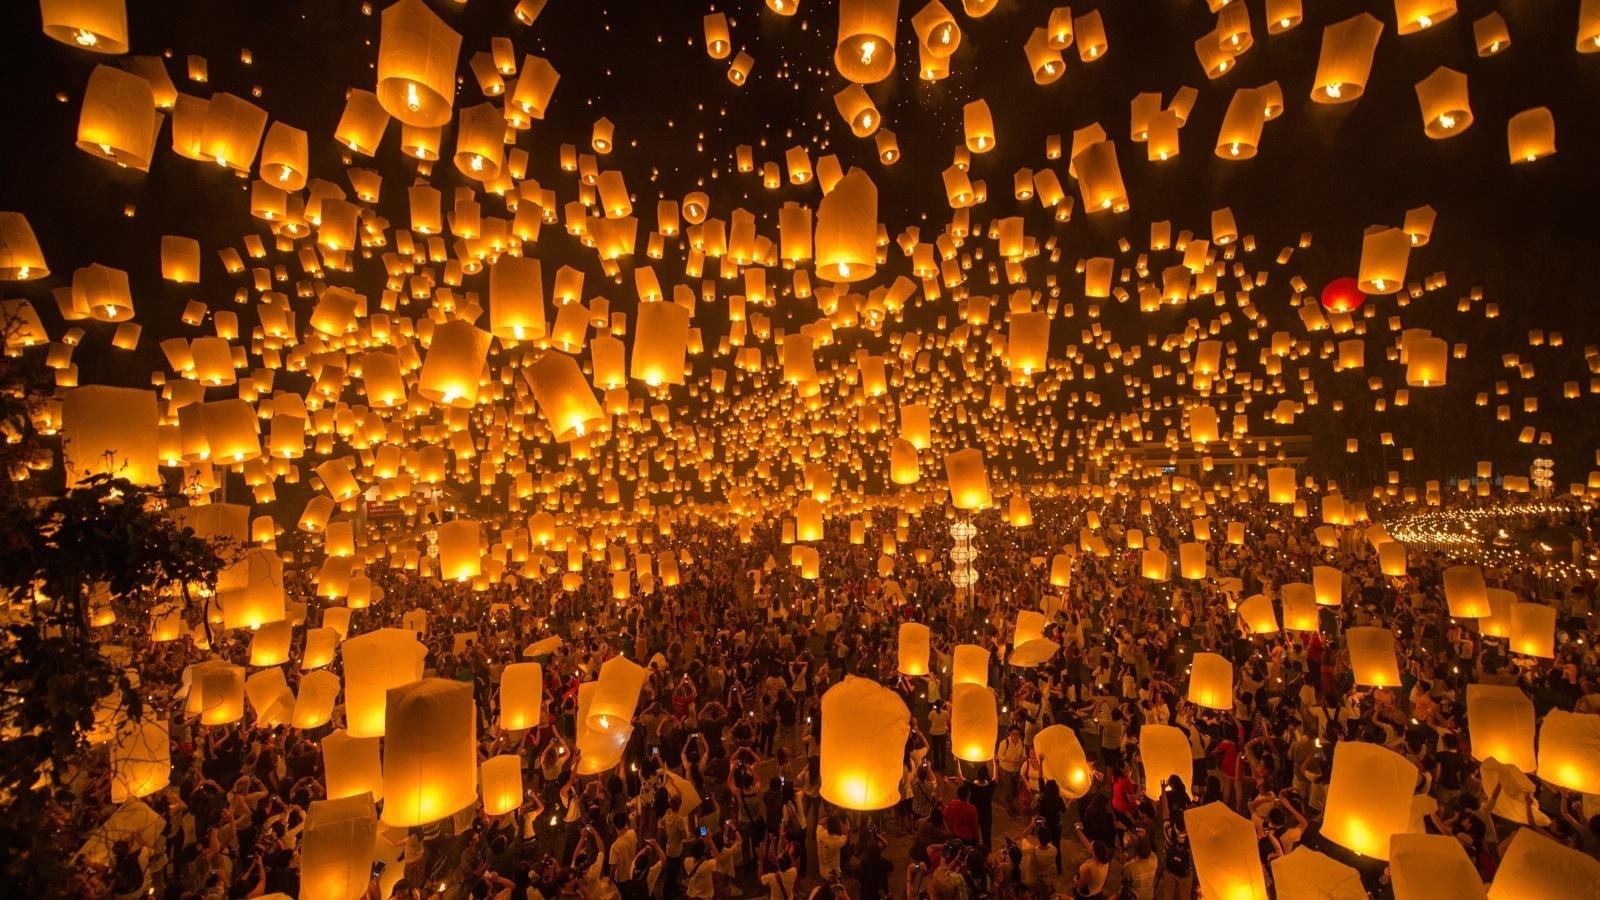 Lantern Festival HD Wallpapers 2 1600x900